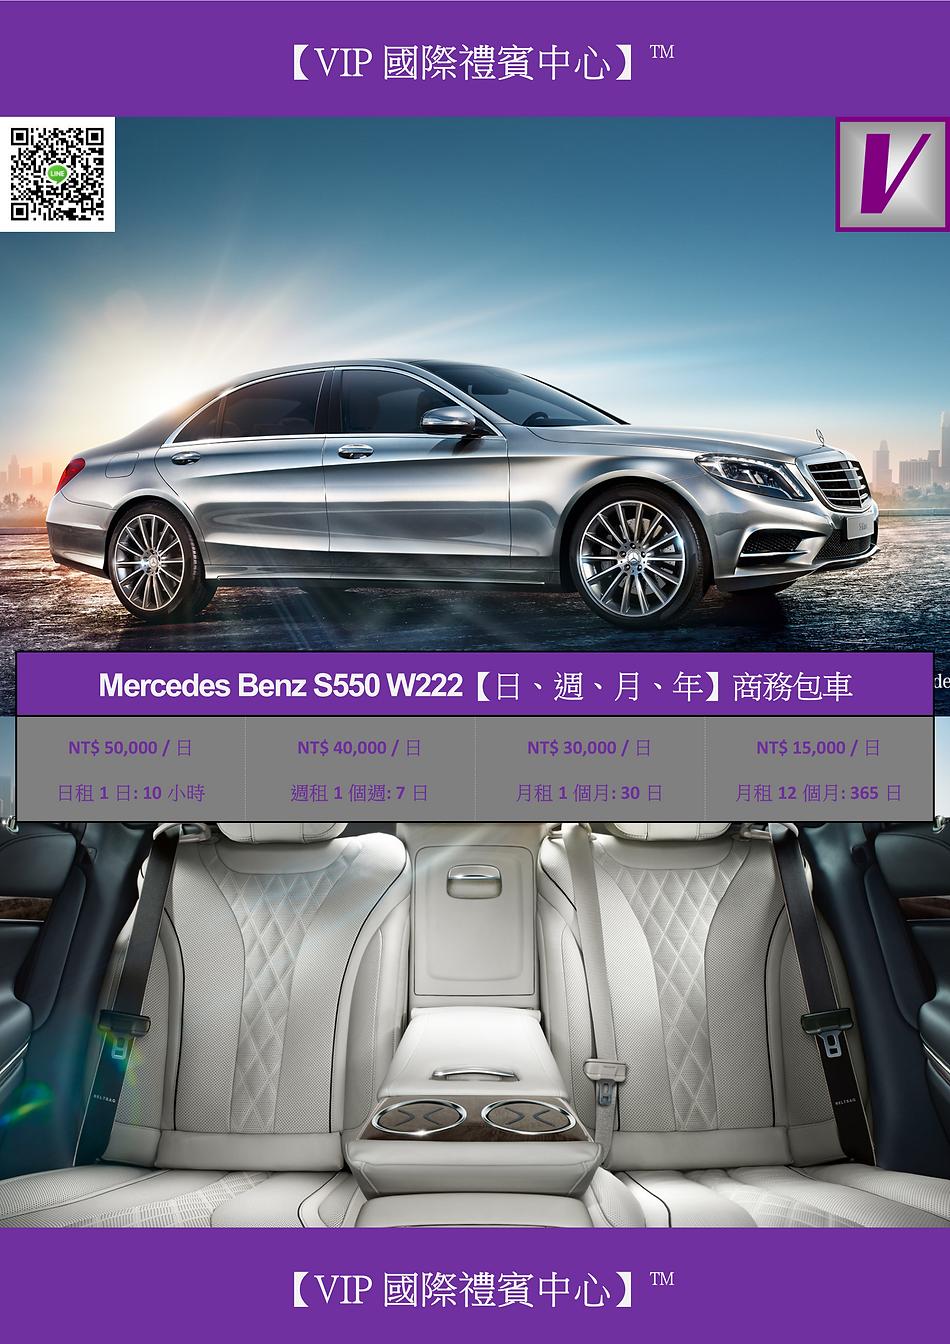 VIP國際禮賓中心 MERCEDES BENZ S550 W222 臺北市區接送包車